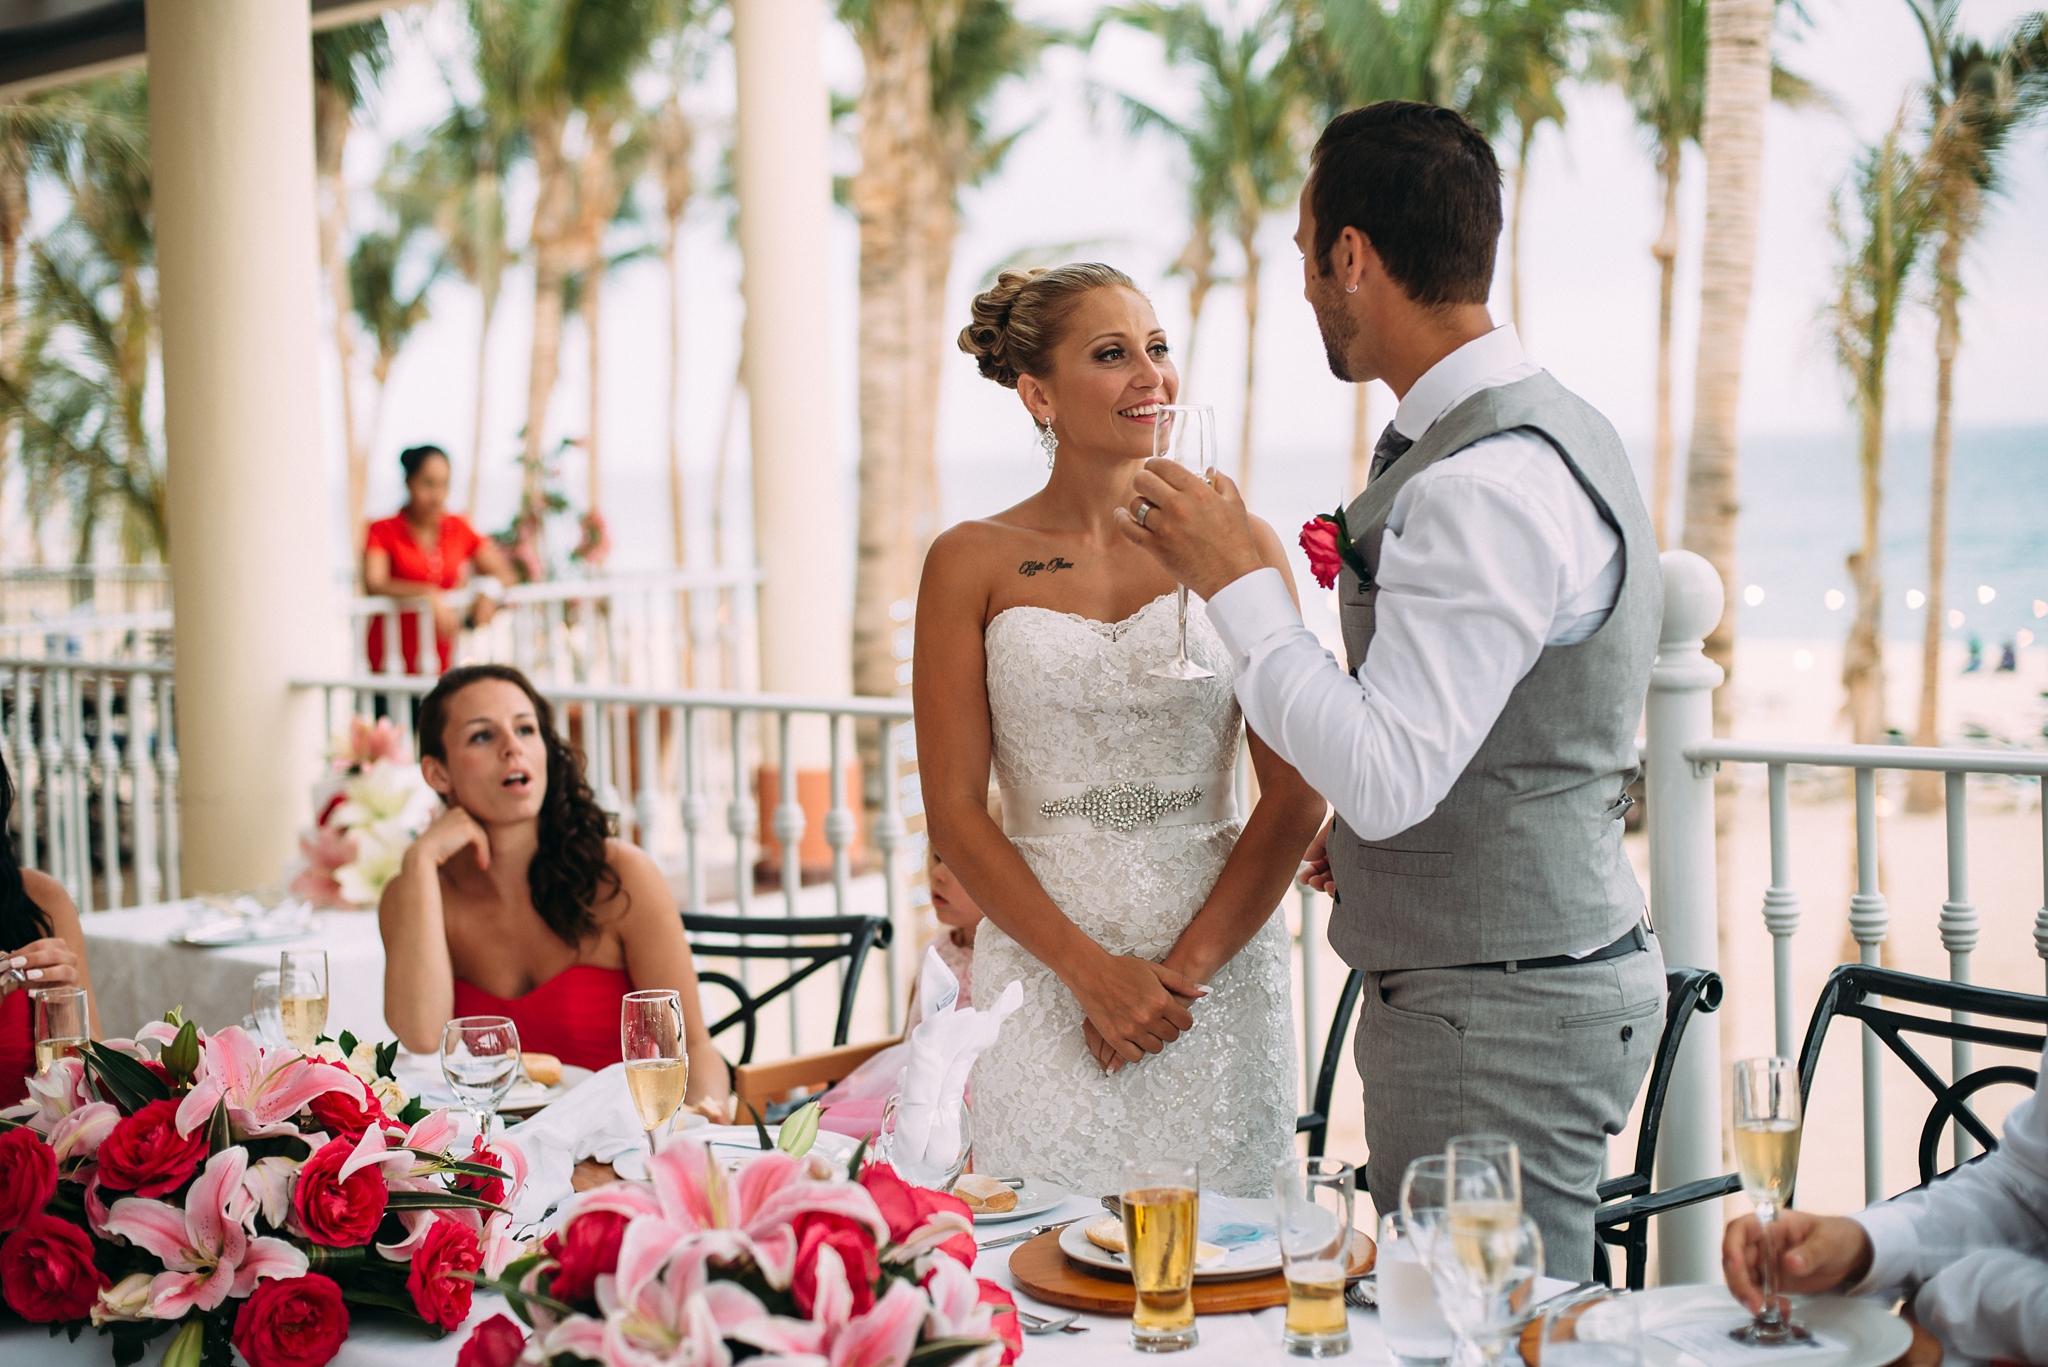 kaihla_tonai_intimate_wedding_elopement_photographer_1382